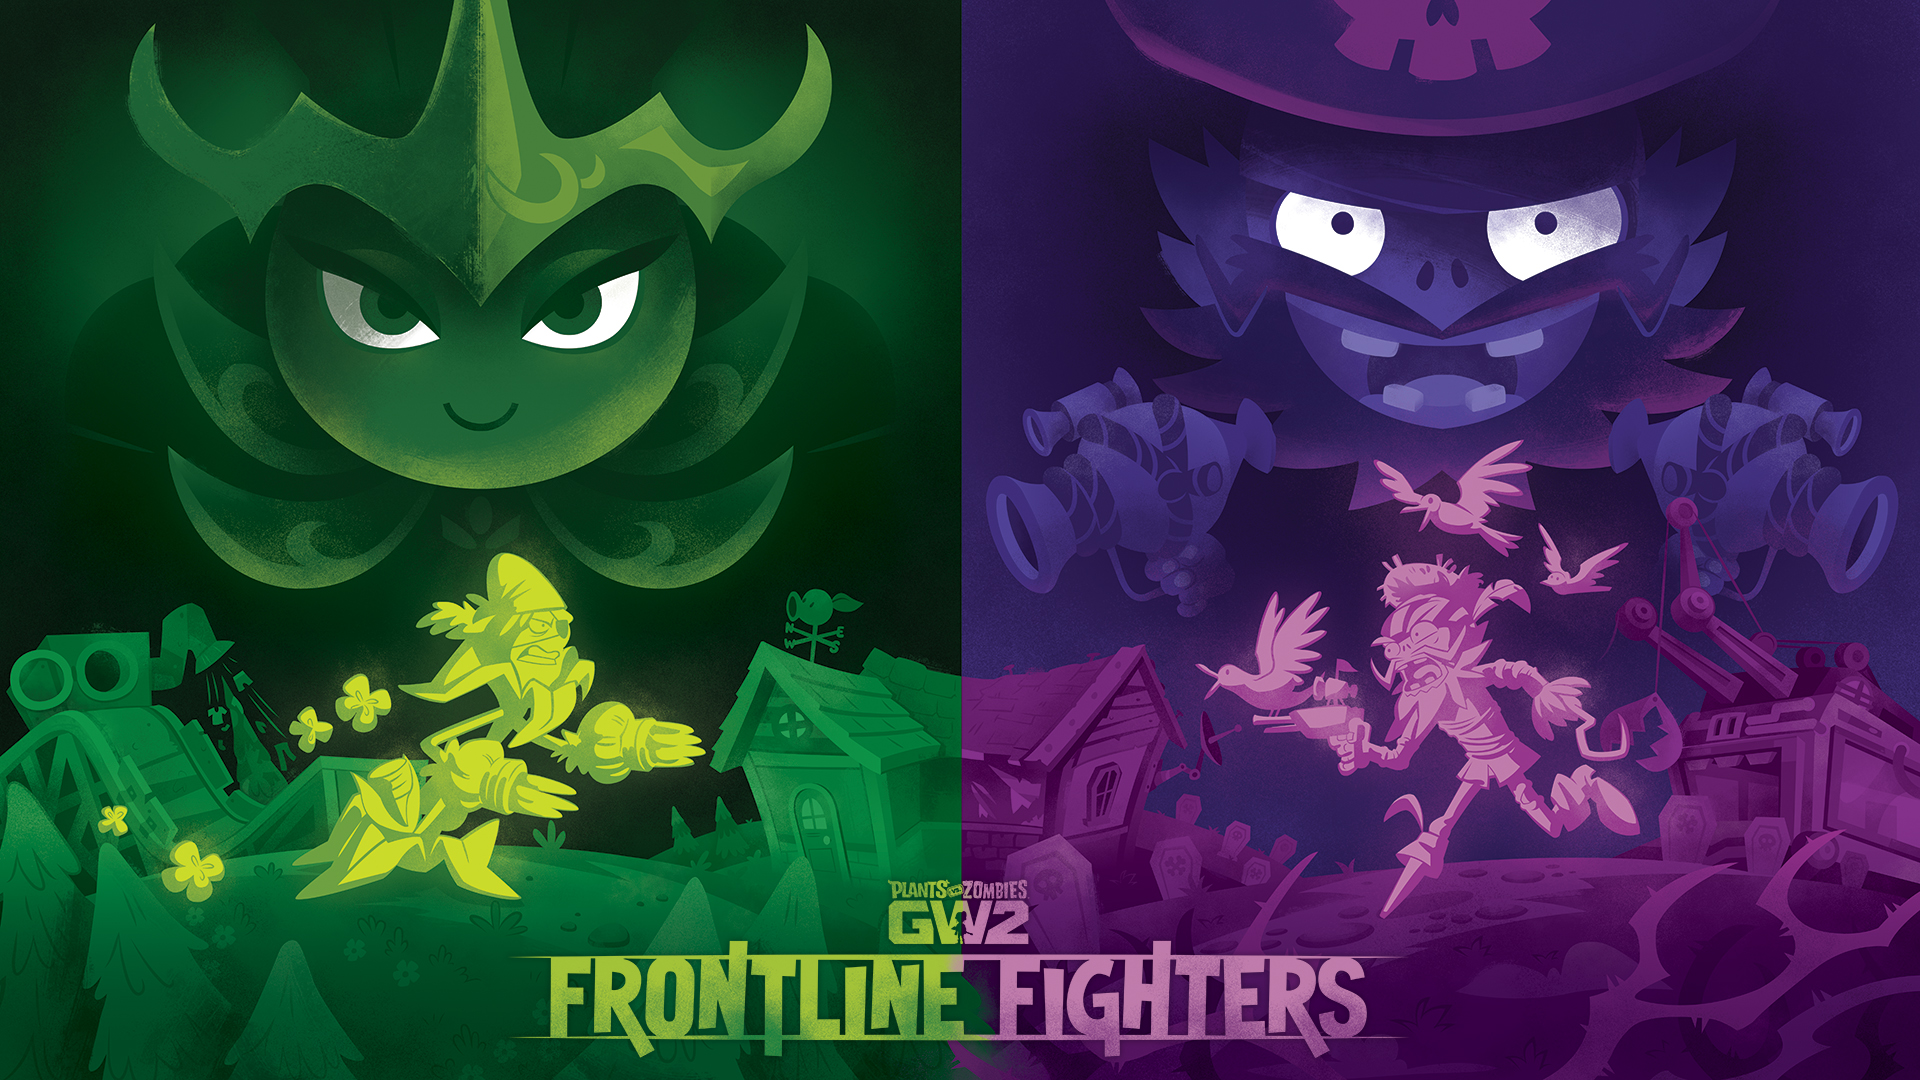 Frontline Fighters DLC